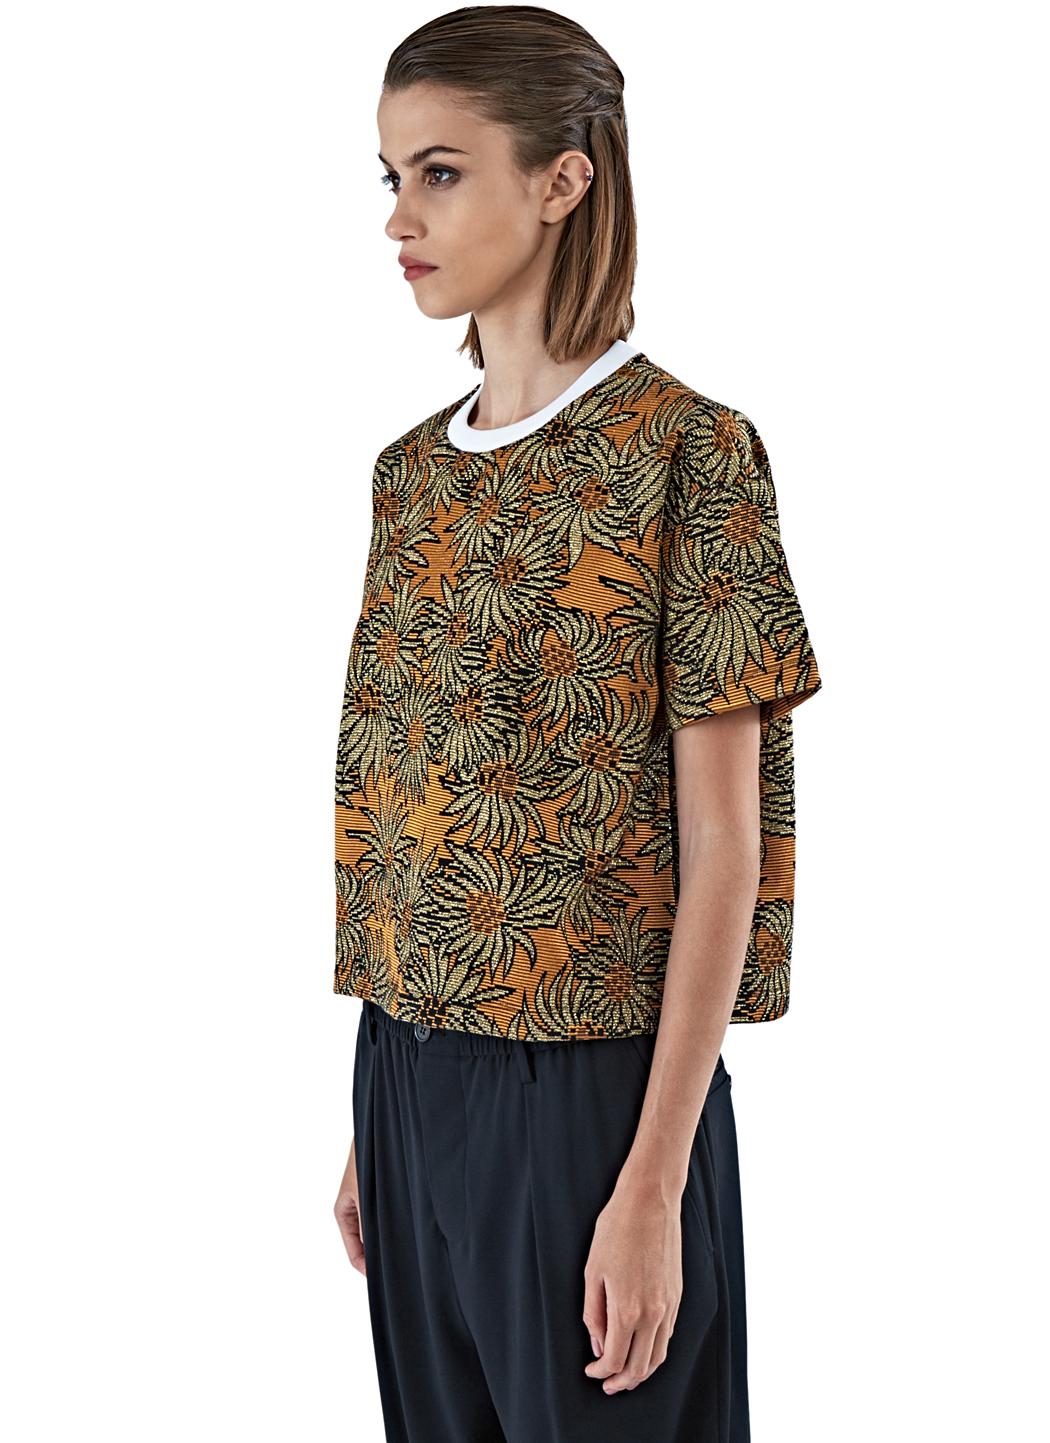 Marni Women's Boxy Lamé Jacquard T-shirt In Gold in ...